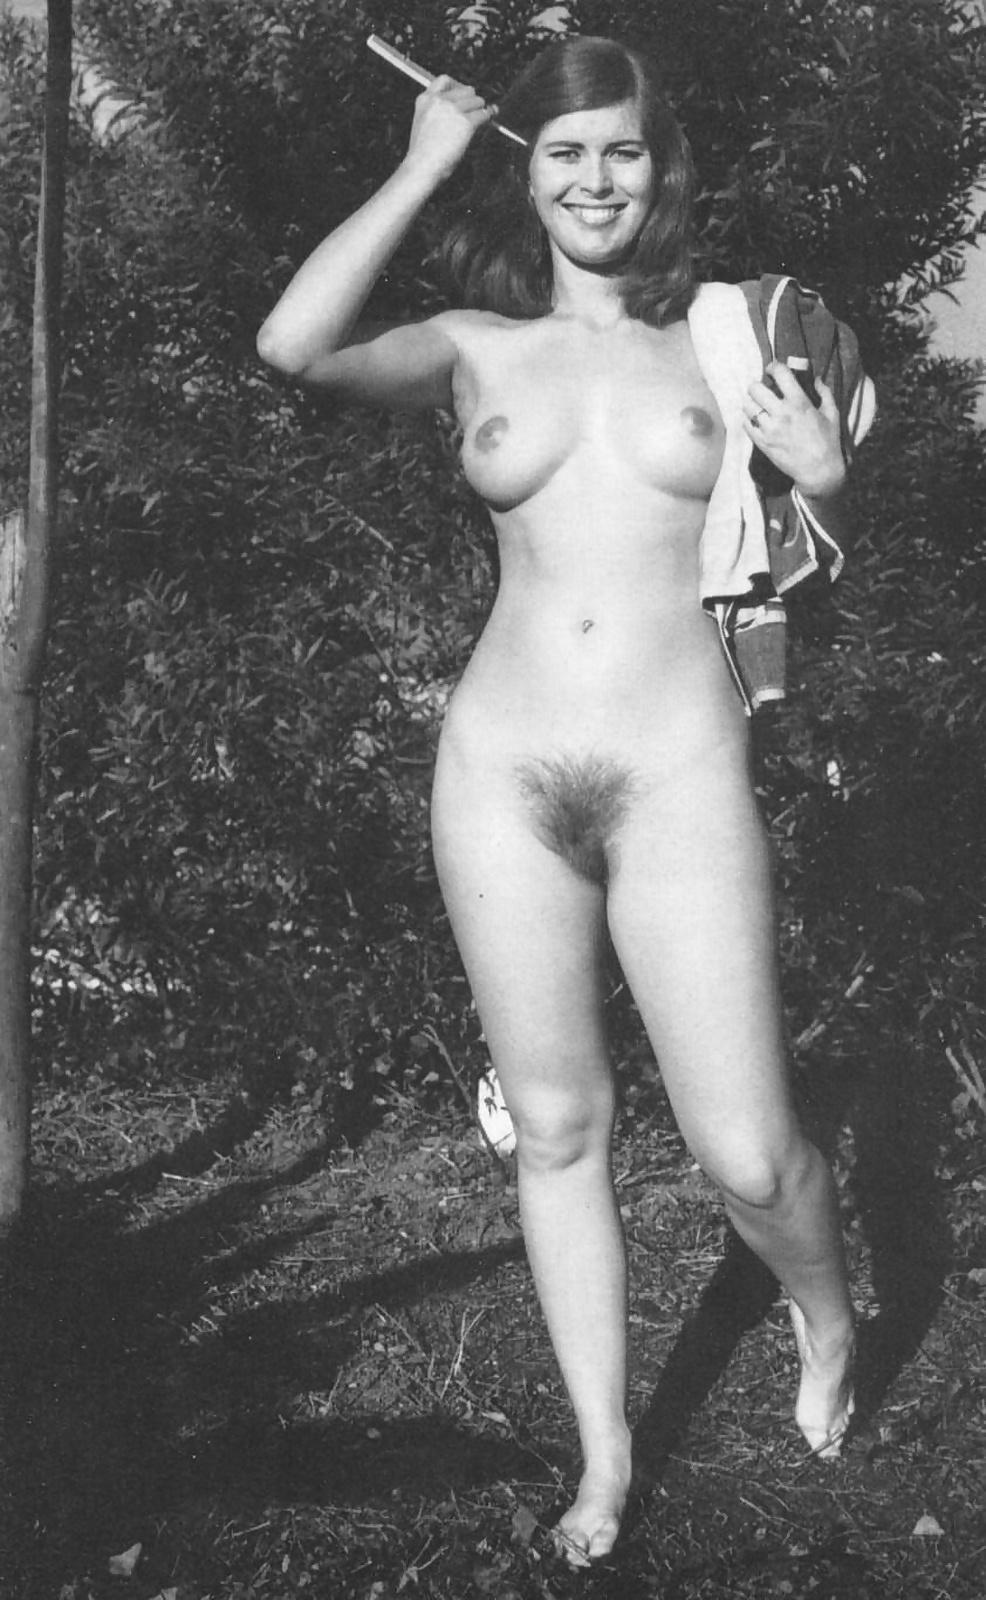 scream-sex-old-photo-of-nude-bmsm-women-tenical-hentia-cosplay